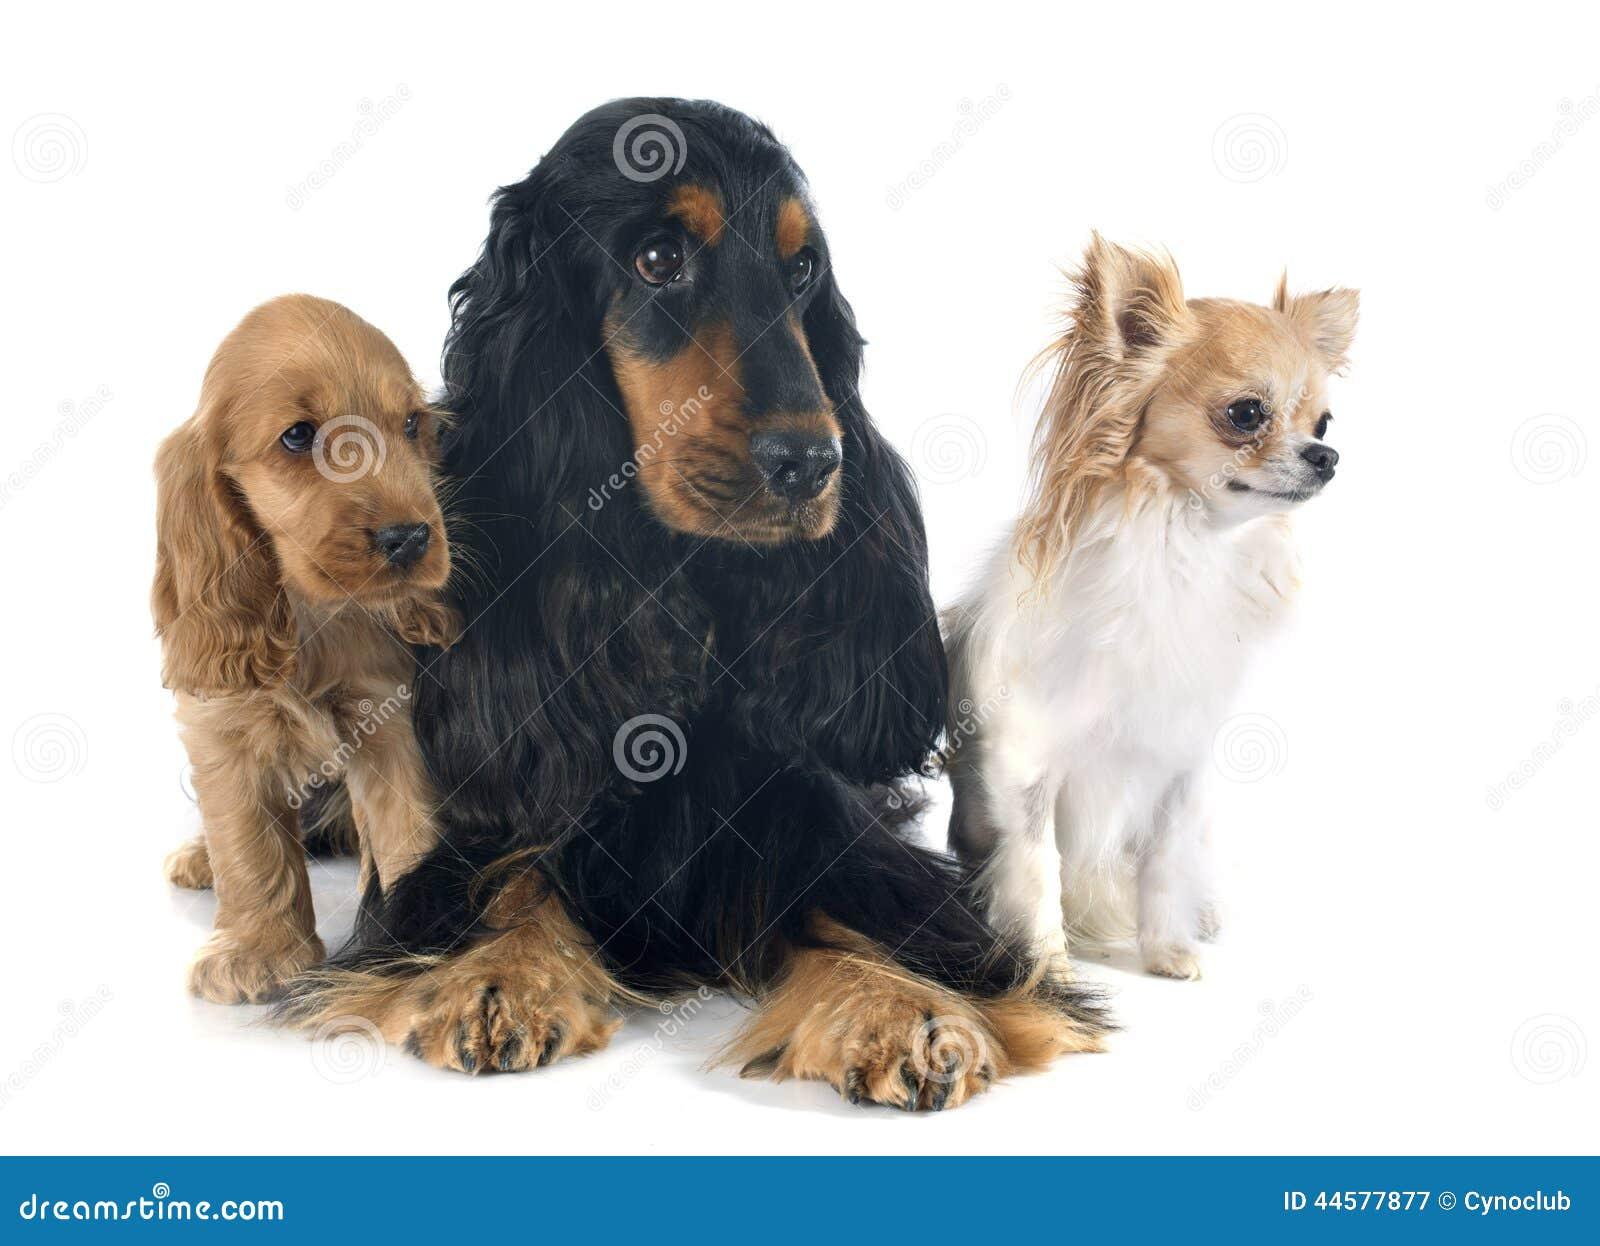 Three little dogs